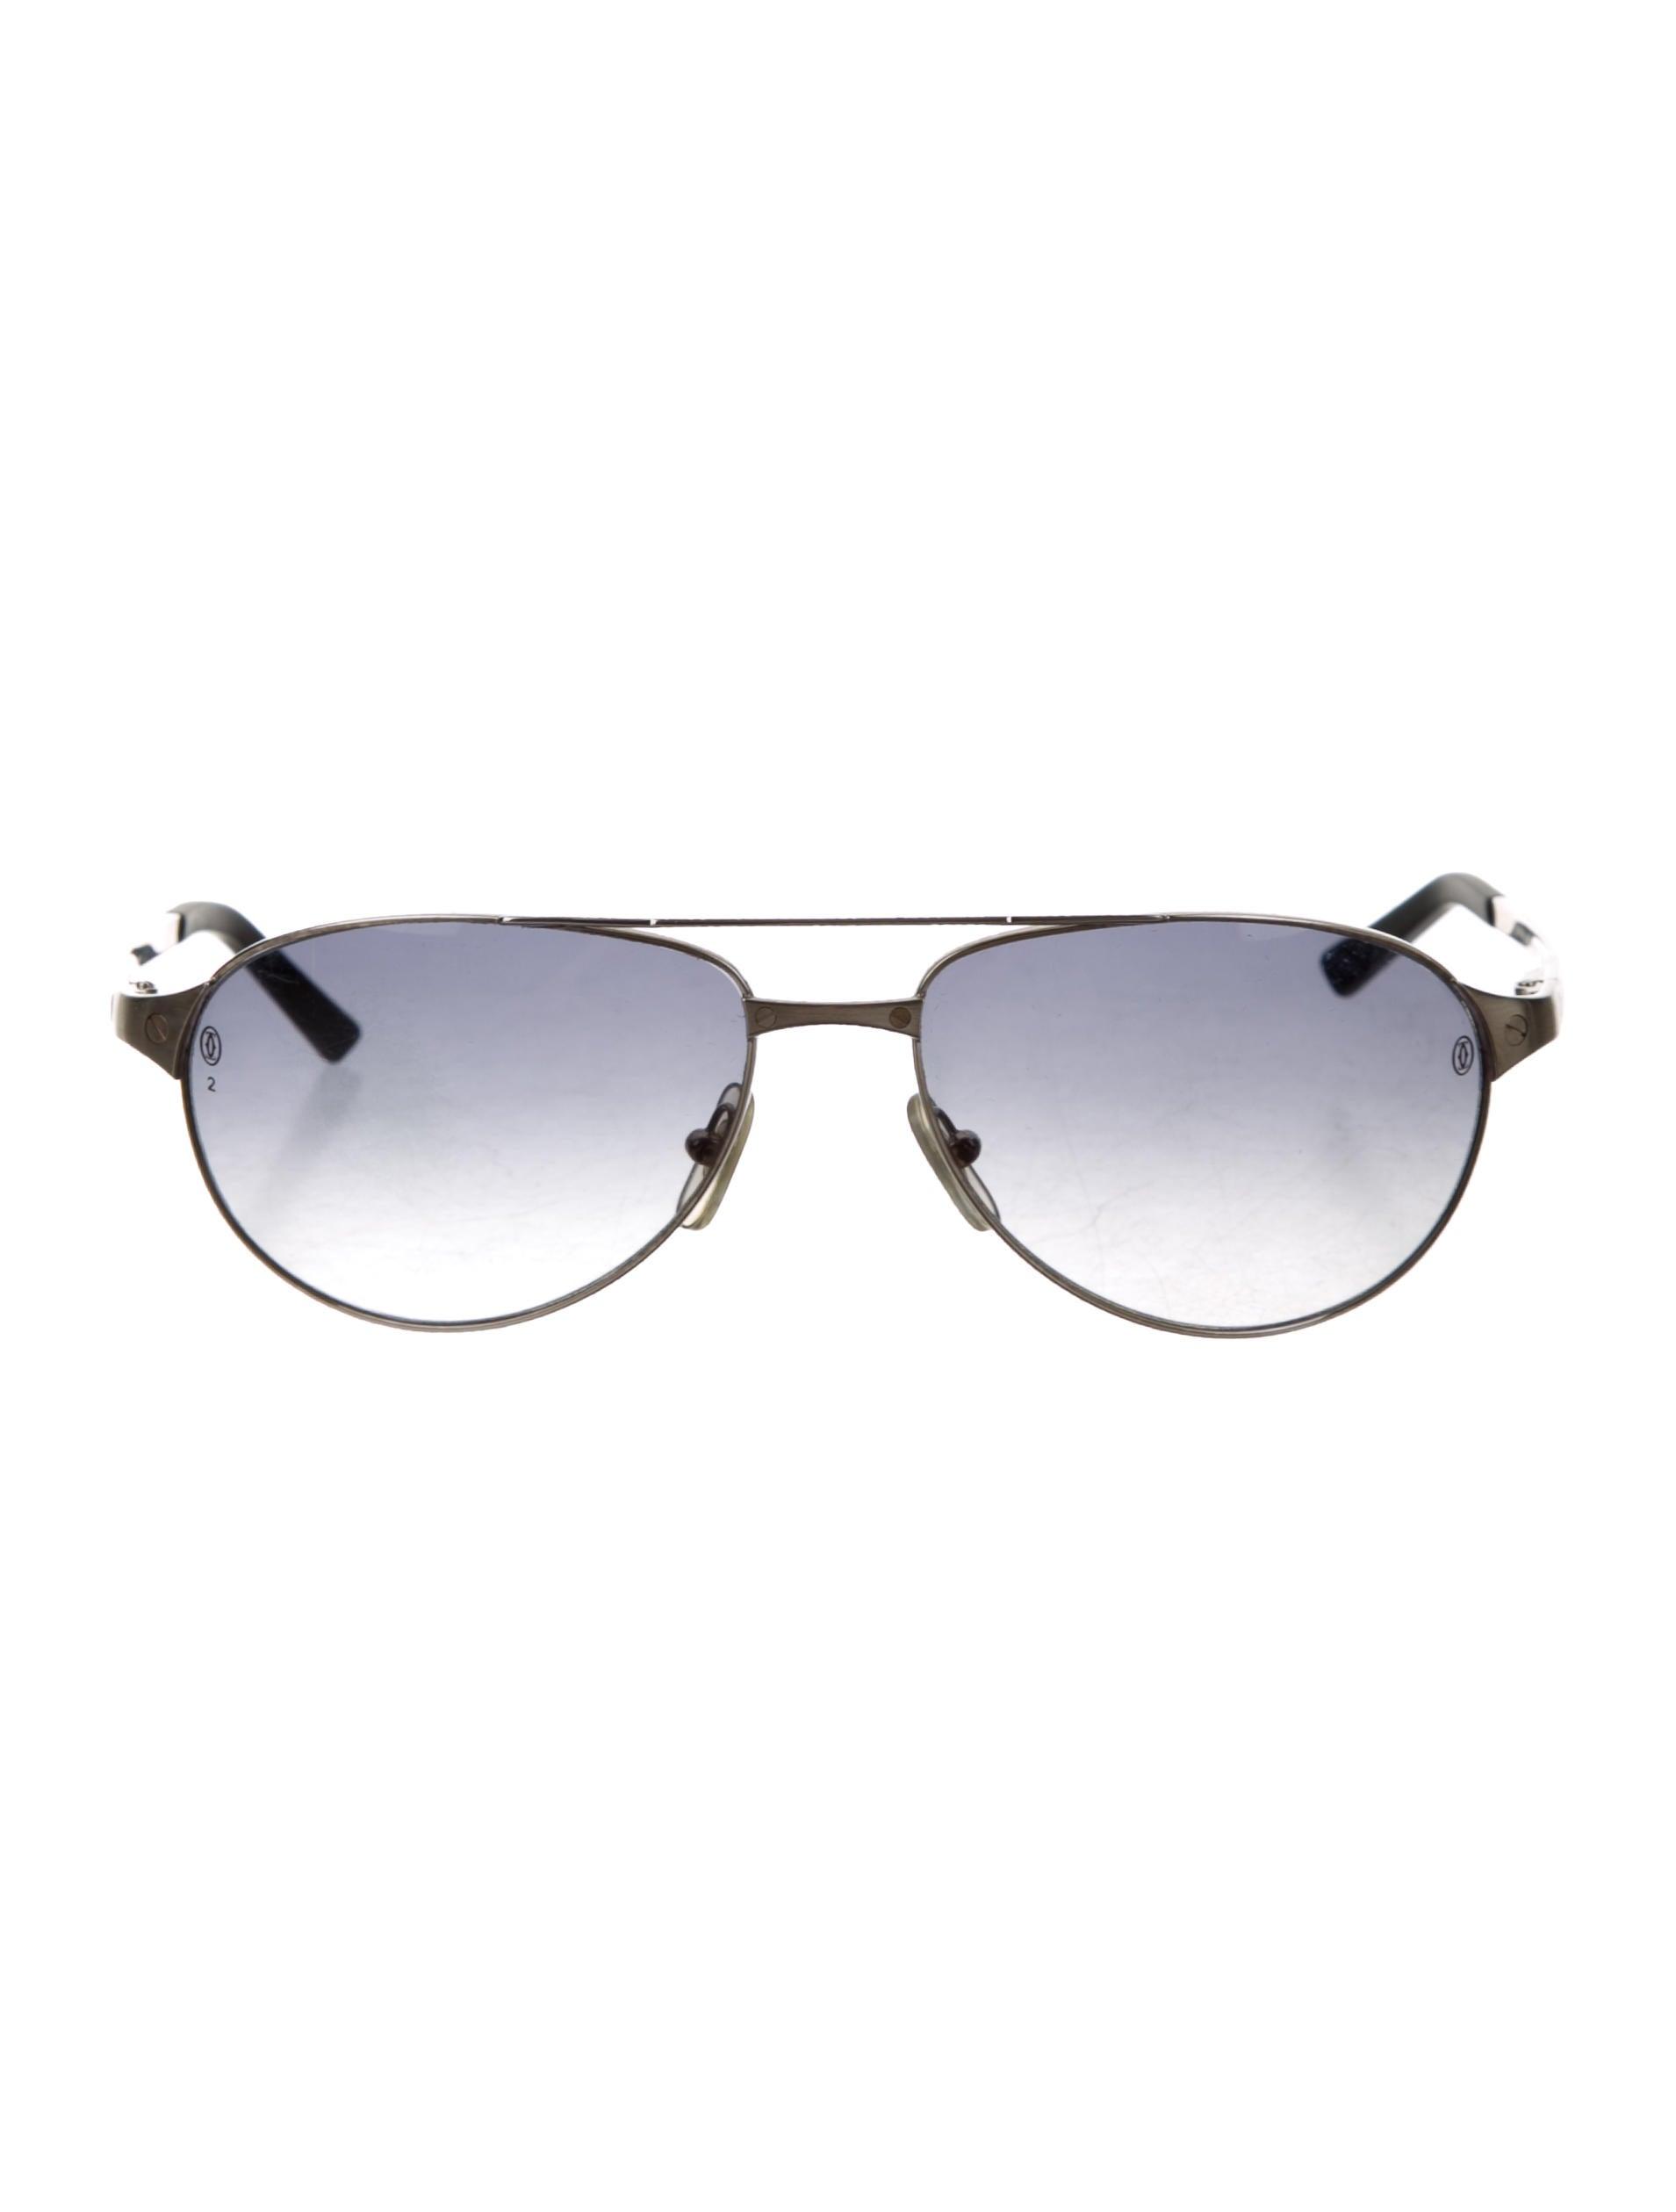 eed406991abfe Cartier Santos Dumont Aviator Sunglasses - Accessories - CRT31906